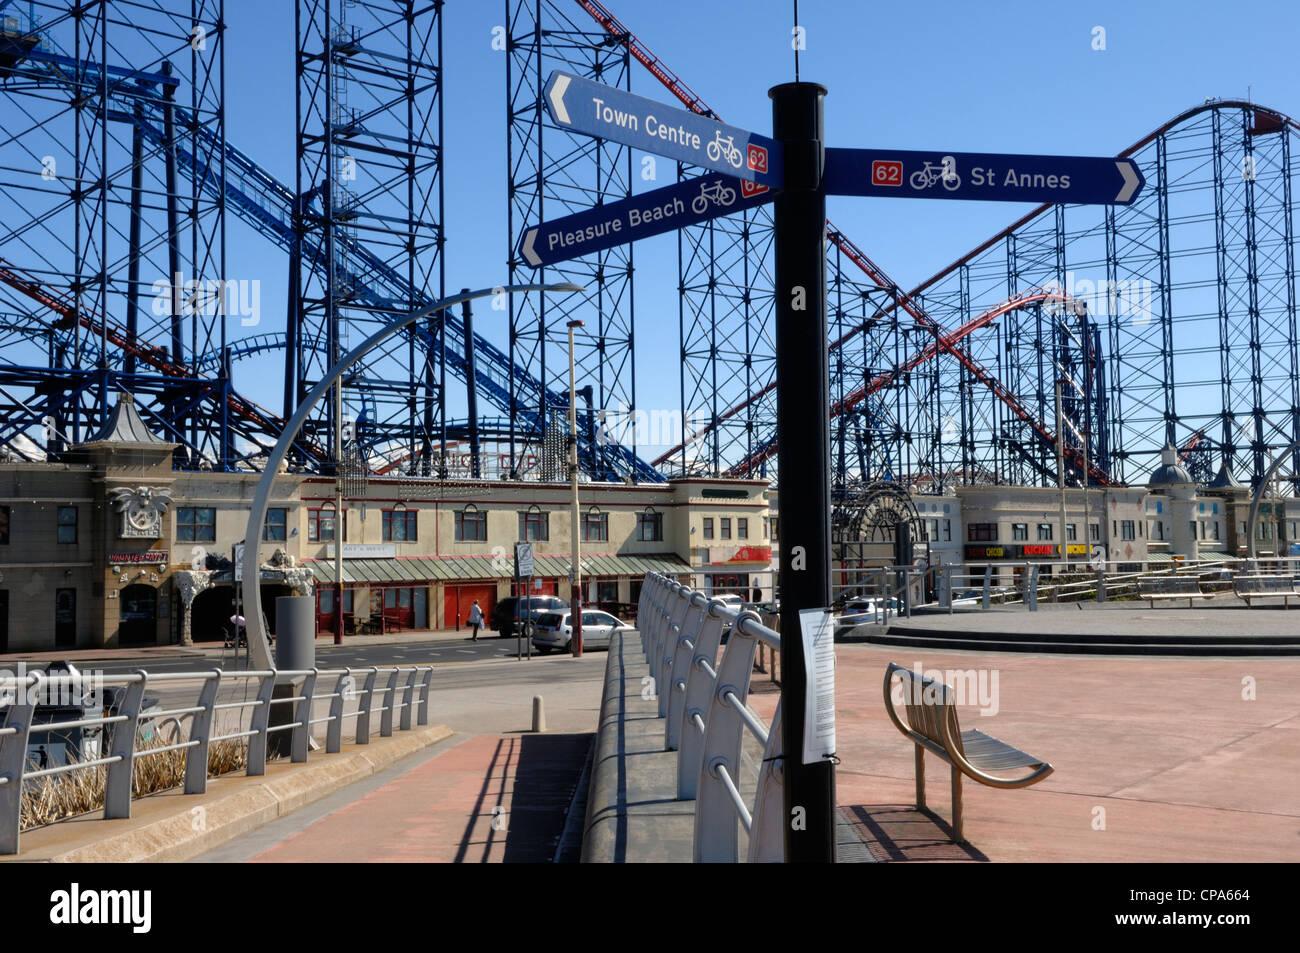 Blackpool Pleasure Beach cycle way - Stock Image